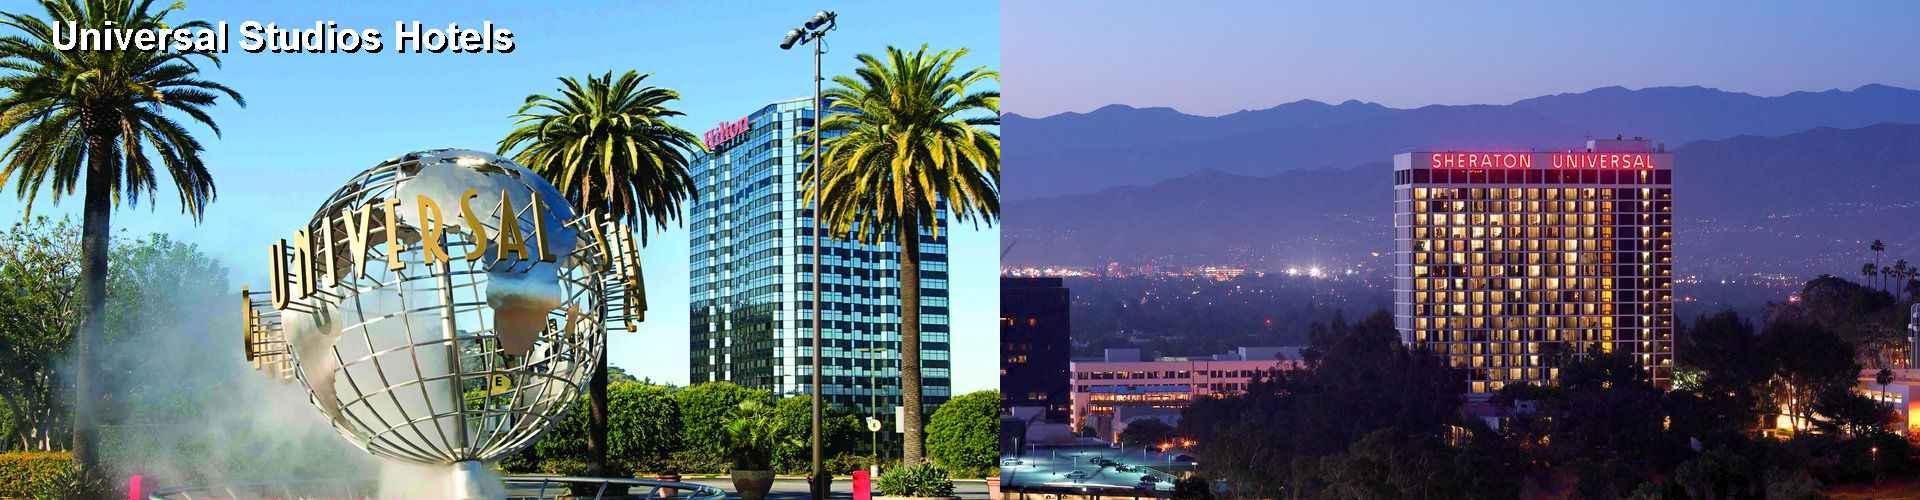 $78+ Hotels Near Universal Studios In Los Angeles Ca - Map Of Hotels Near Universal Studios California